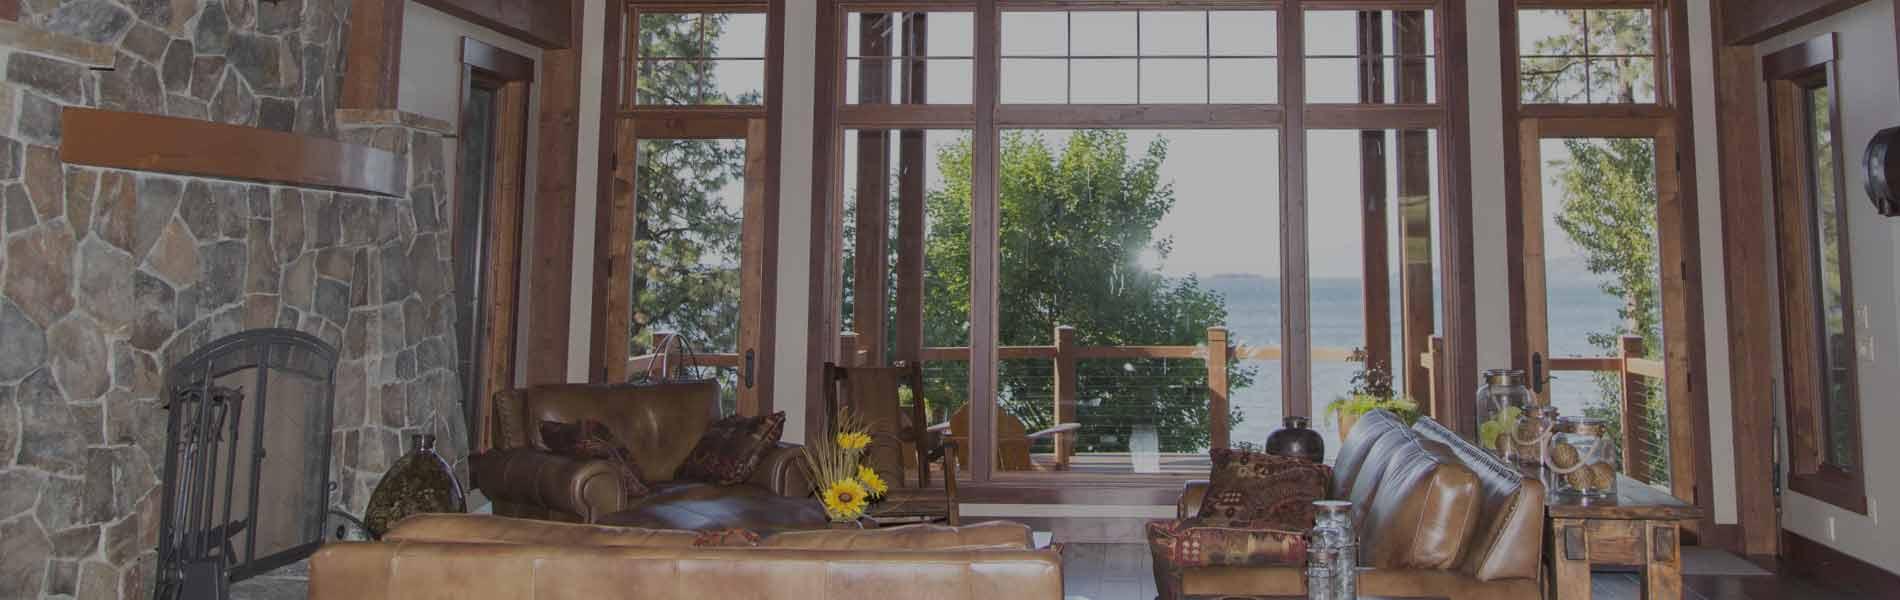 Permalink to: Property Maintenance